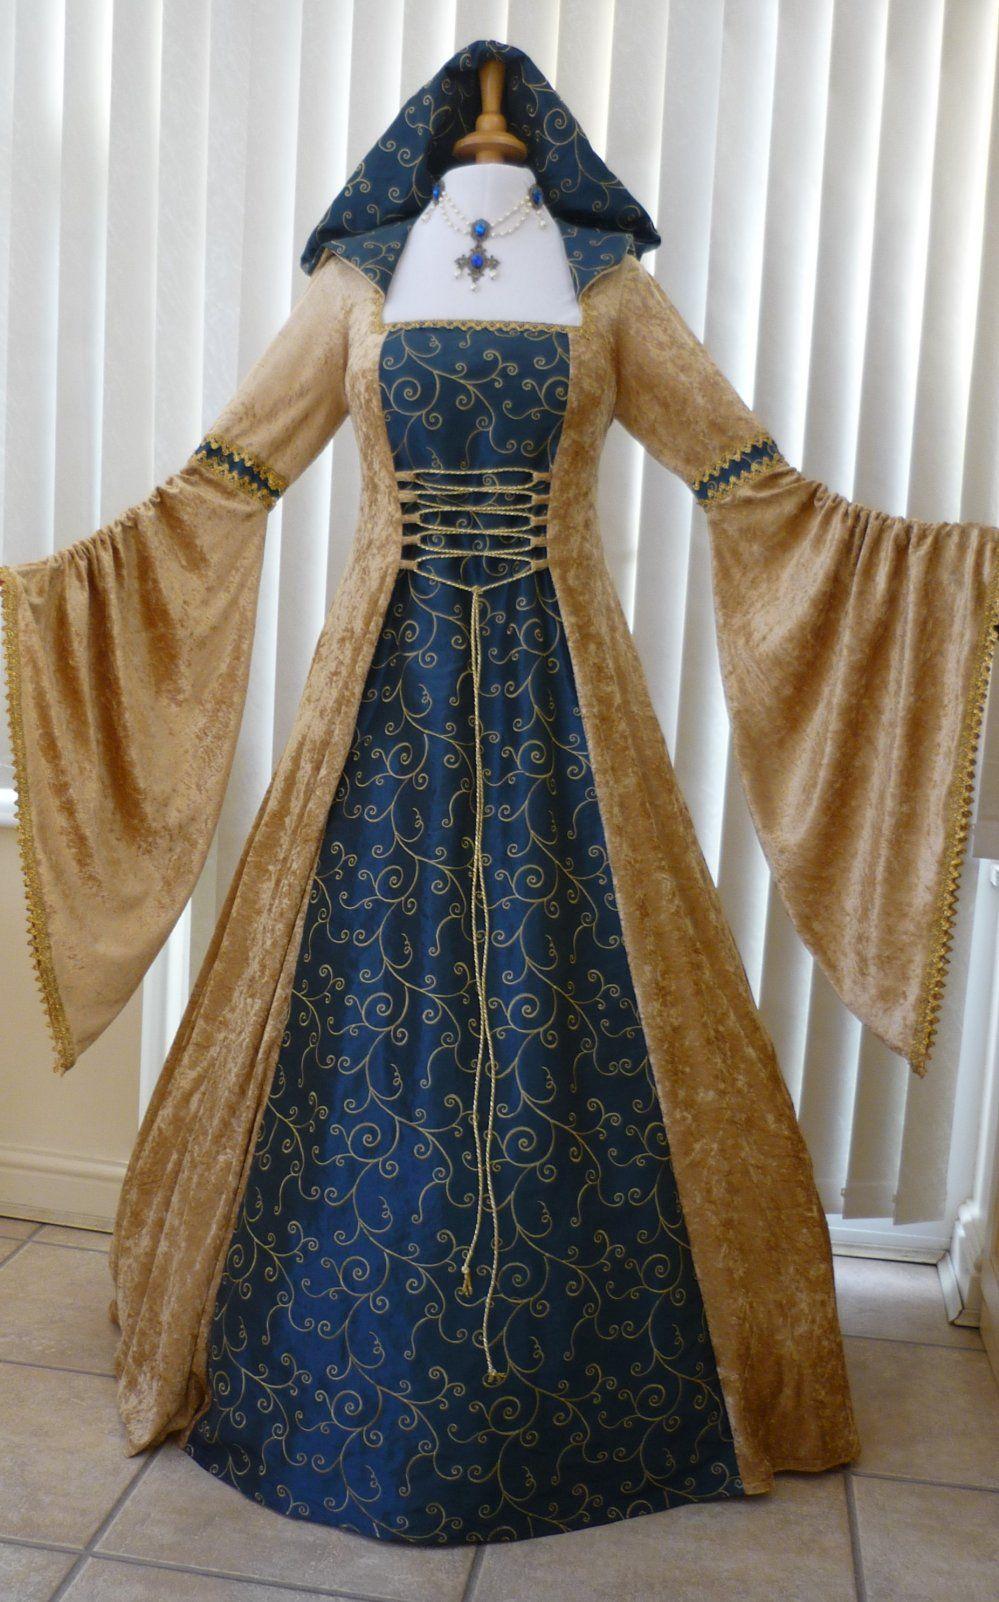 pagan wedding dresses Pagan Handfasting Dress Medieval Wedding Gown Gold Blue Dawns Medieval Dresses